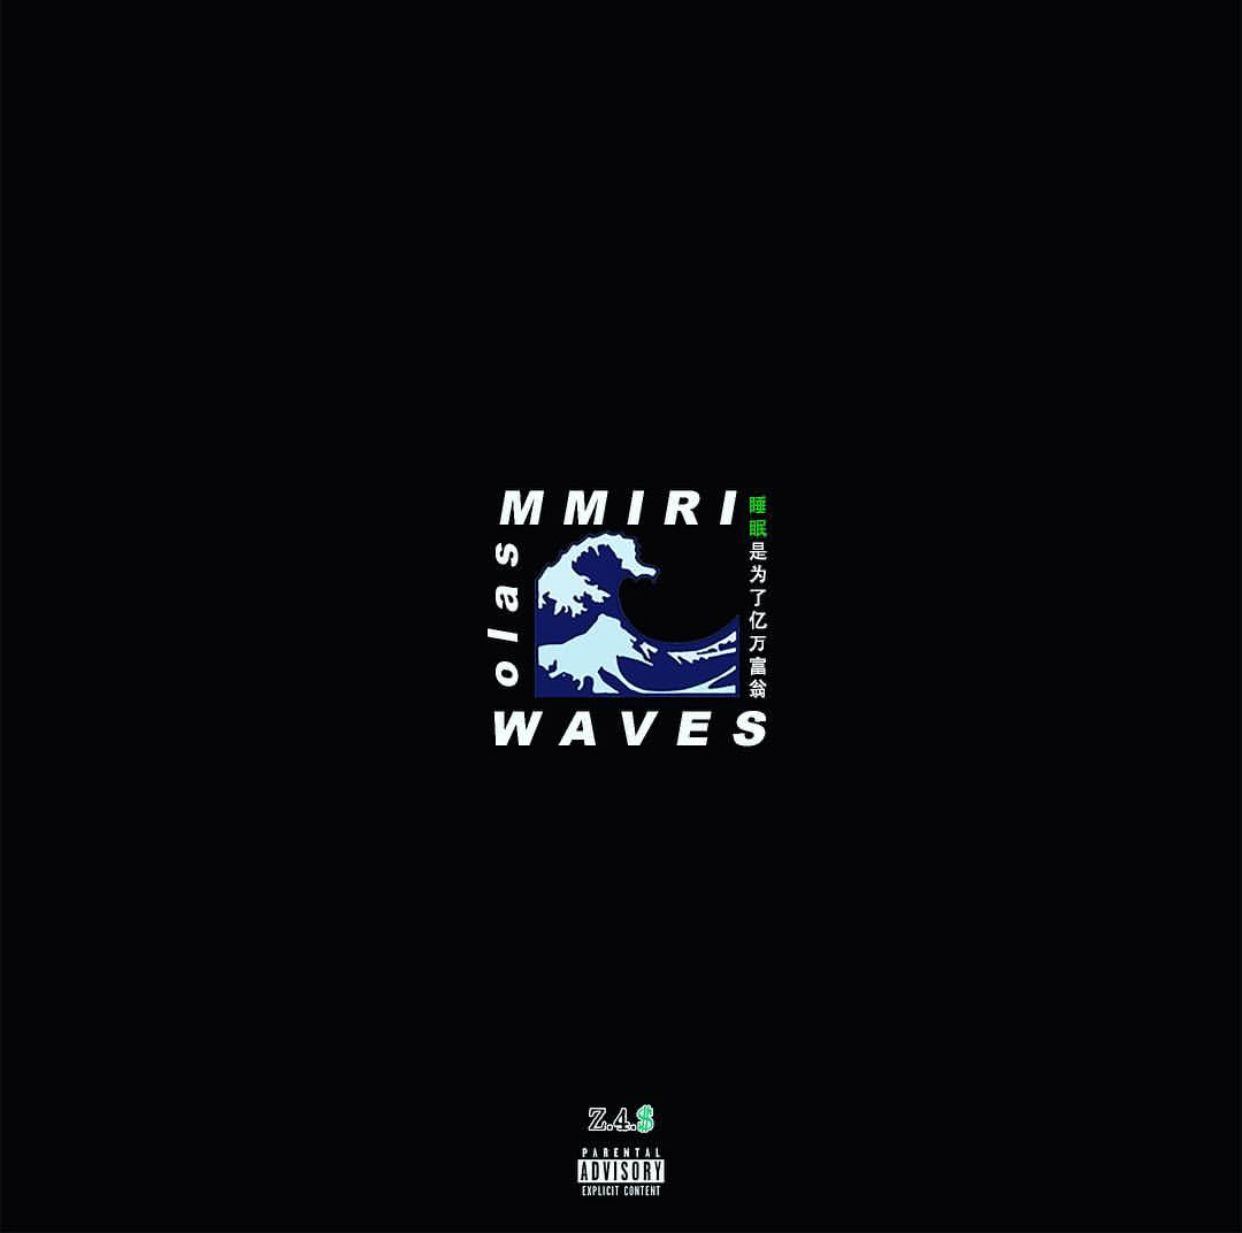 Waves Artwork.jpeg